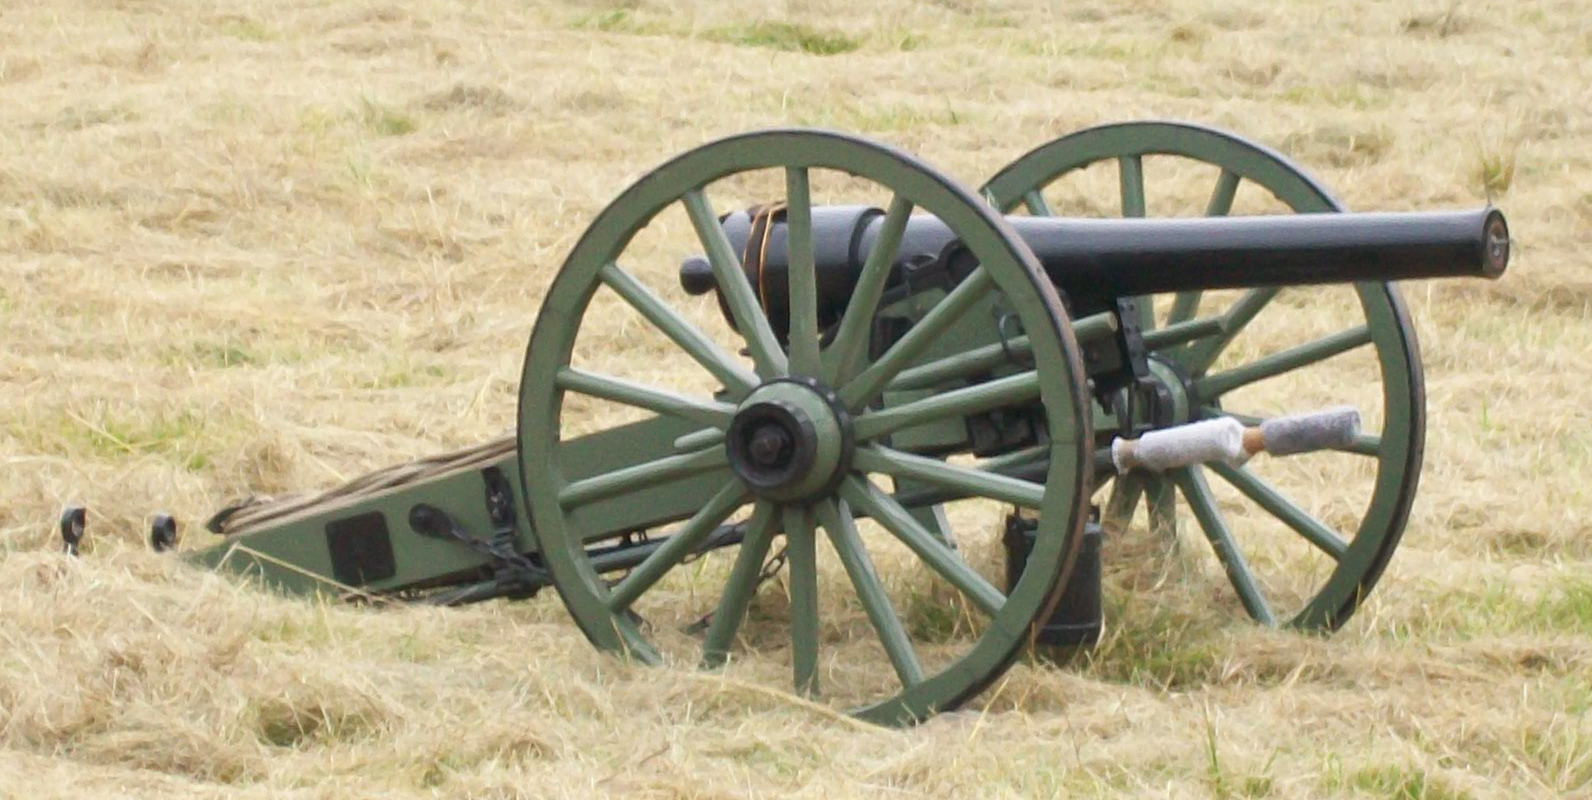 File:american civil war era 10 lb parrott rifle used in the battle of